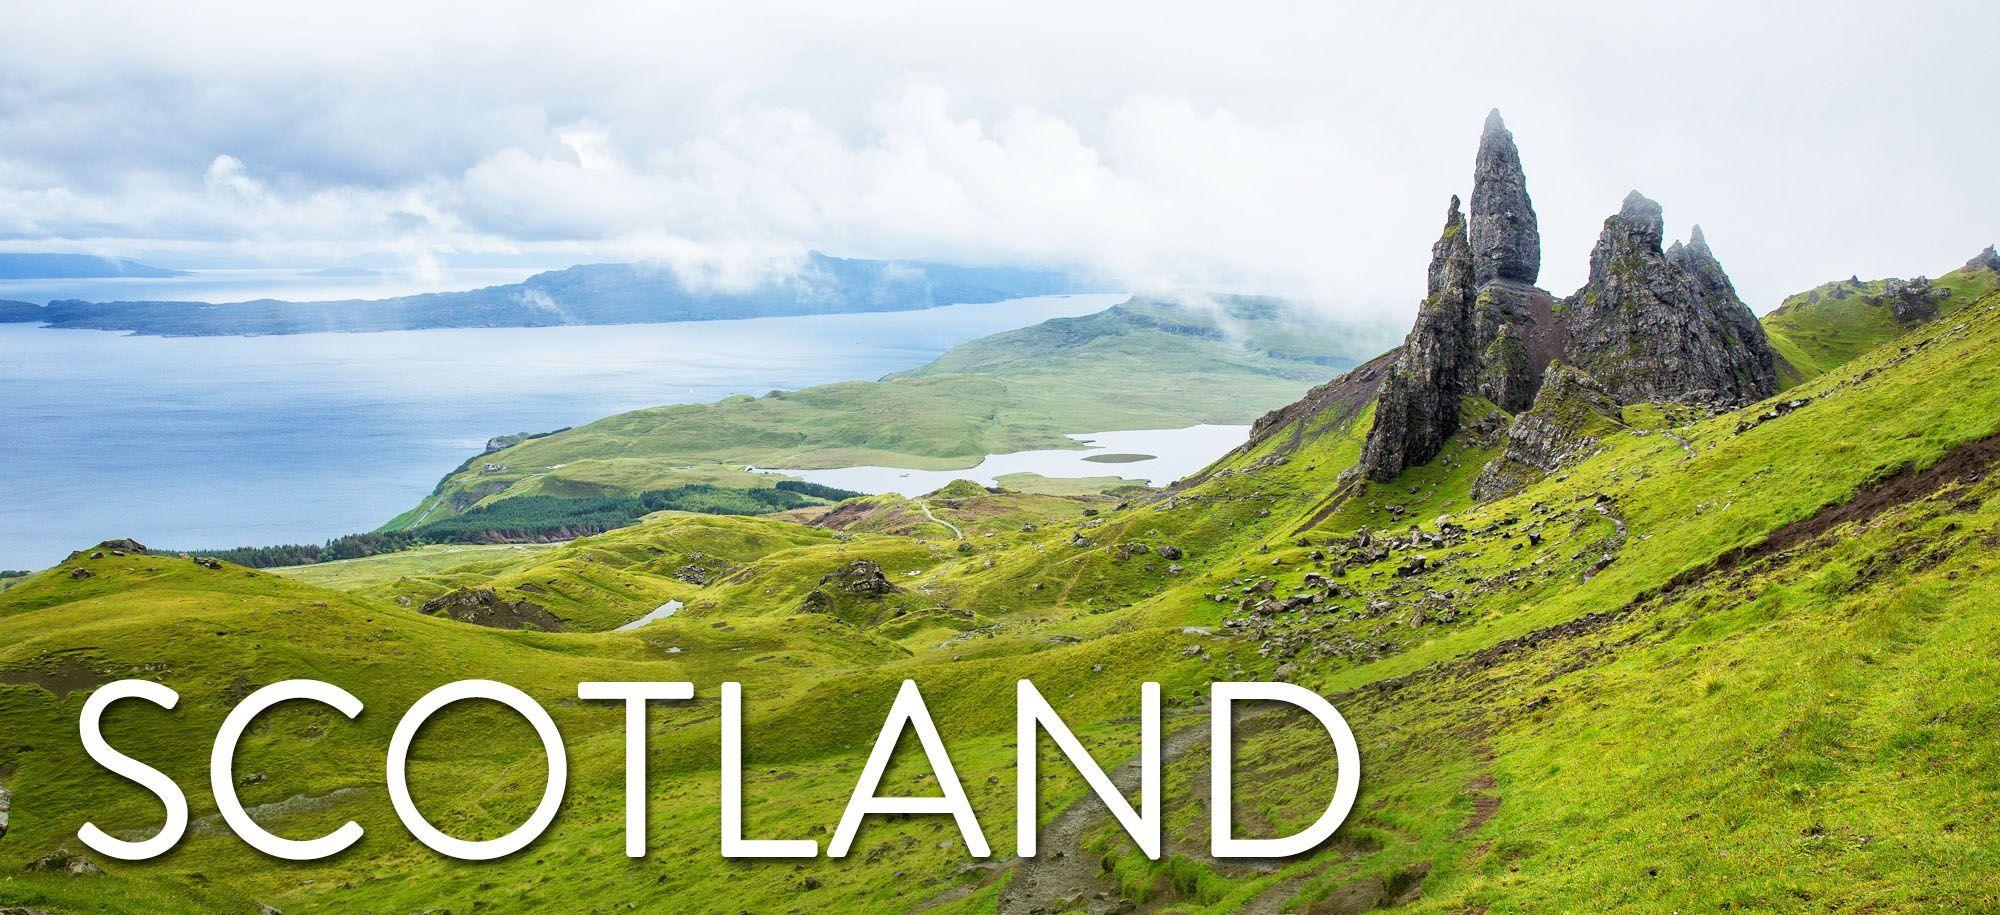 Scotland going on a two months lockdown Nicola sturgeon says